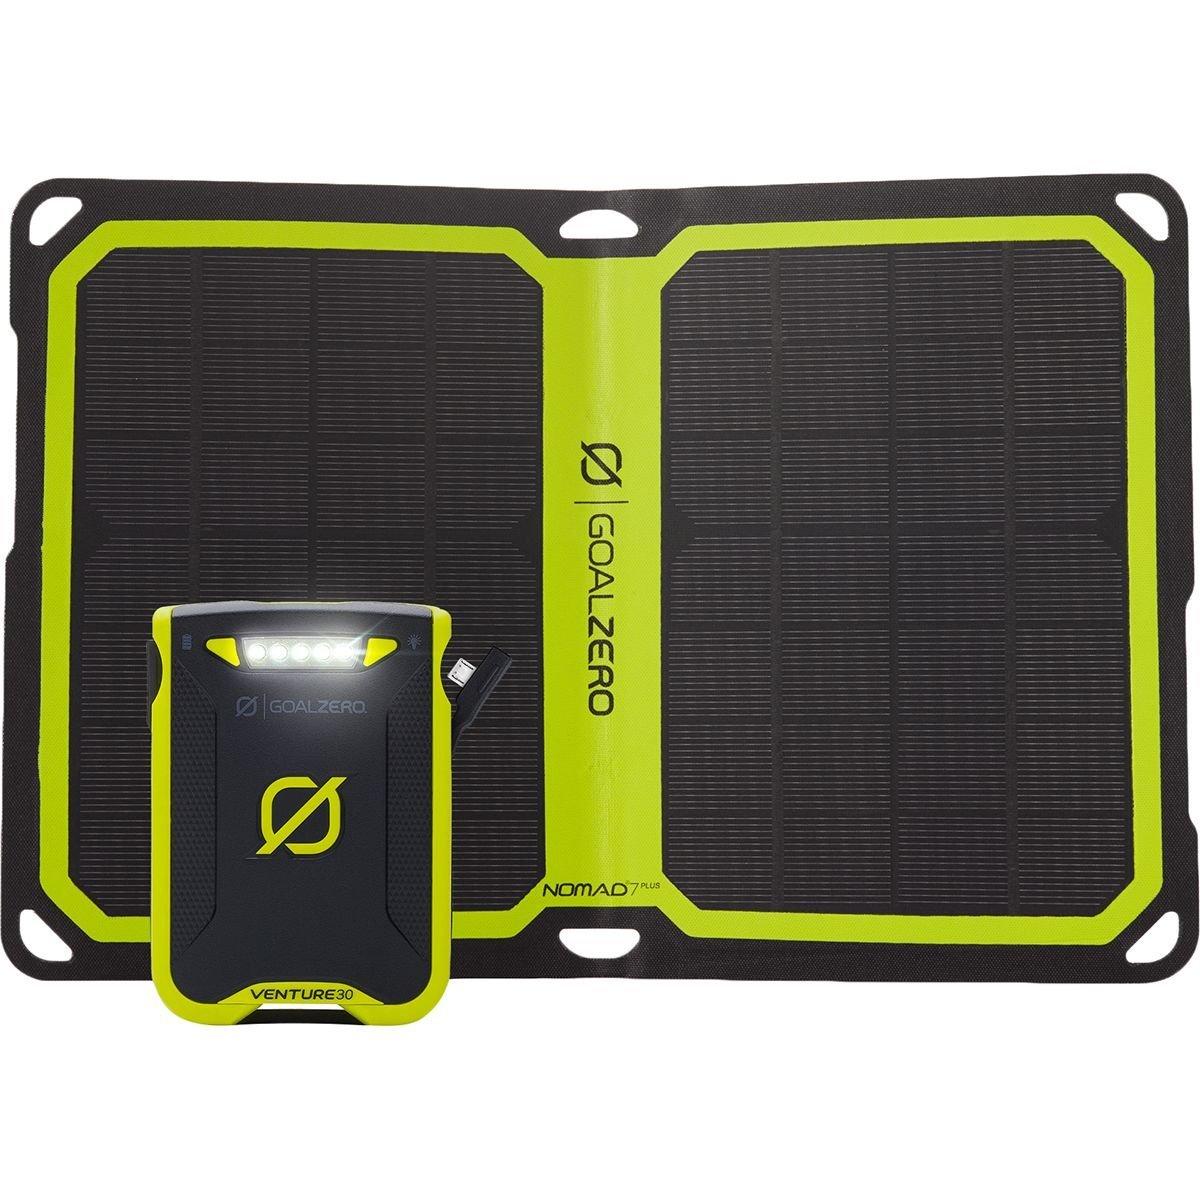 Best Portable Charger Kit OUTDOOR | Goal Zero | Venture 30 & Nomad 7